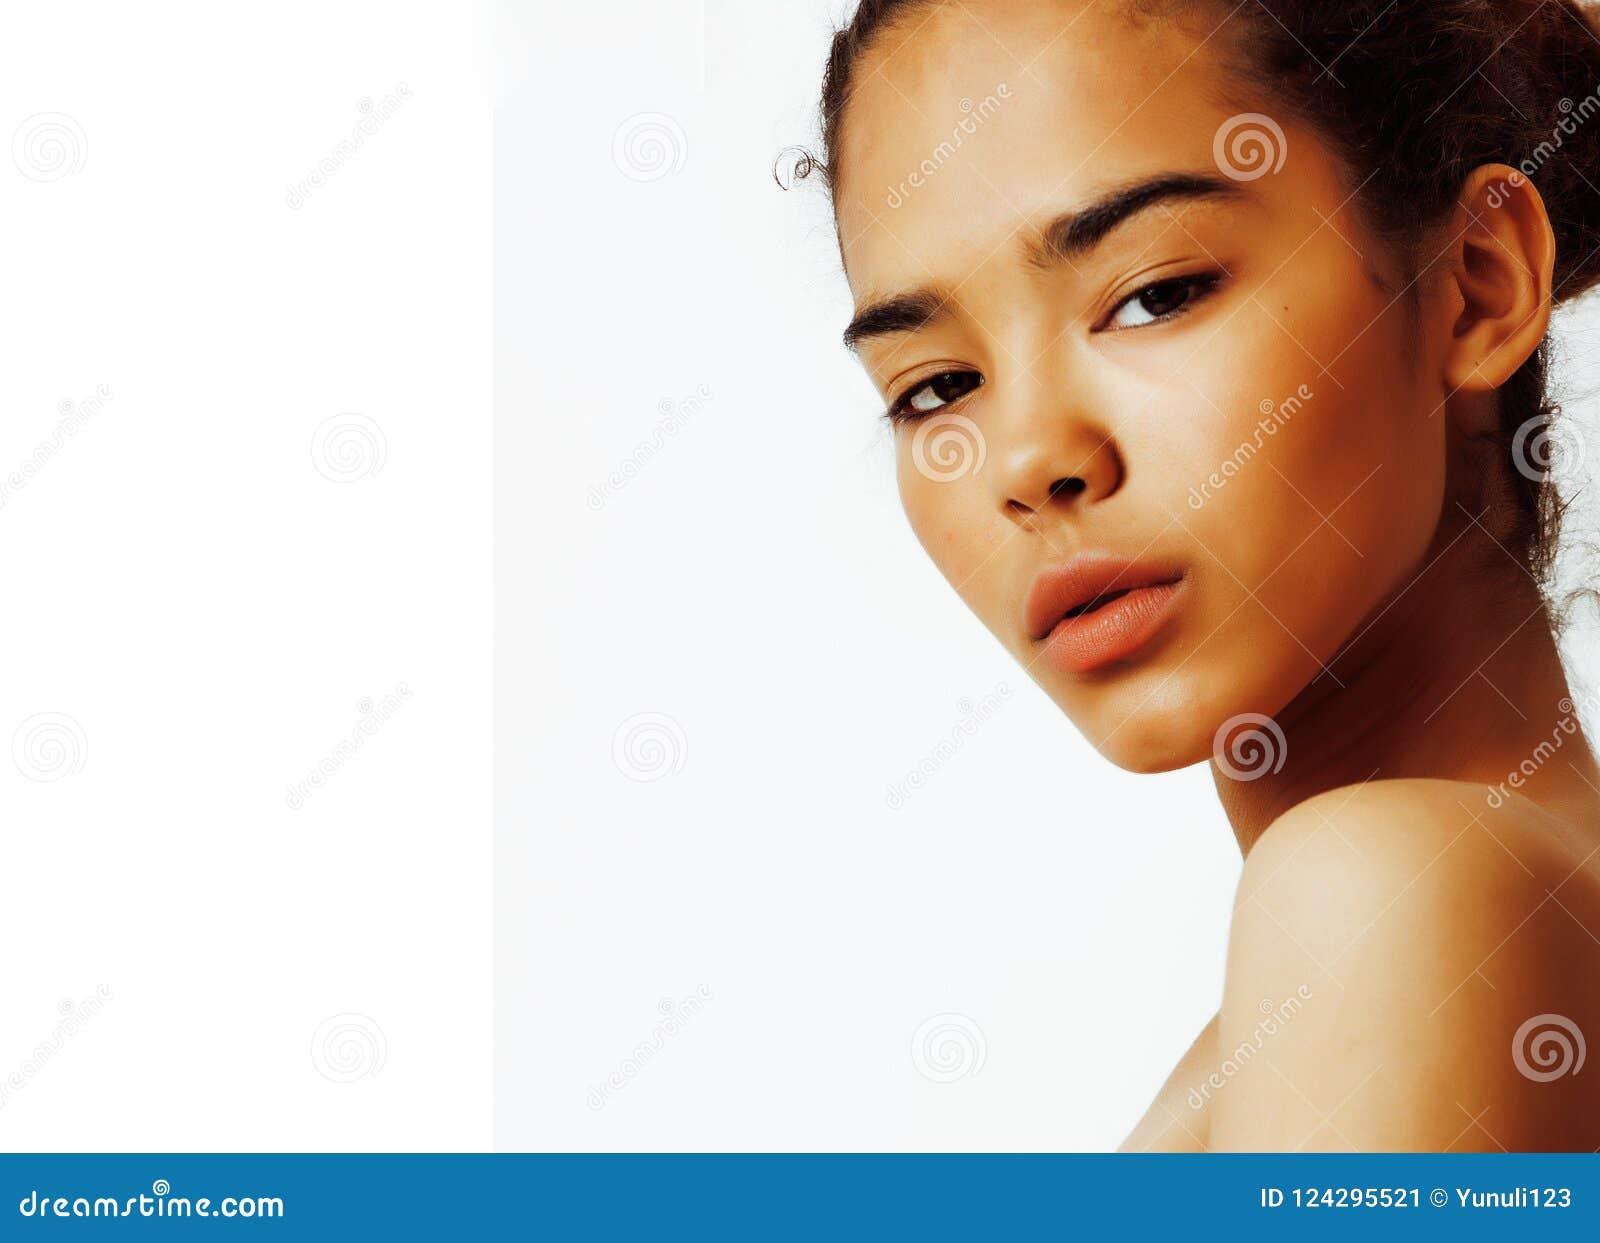 Selena gomez nude flash